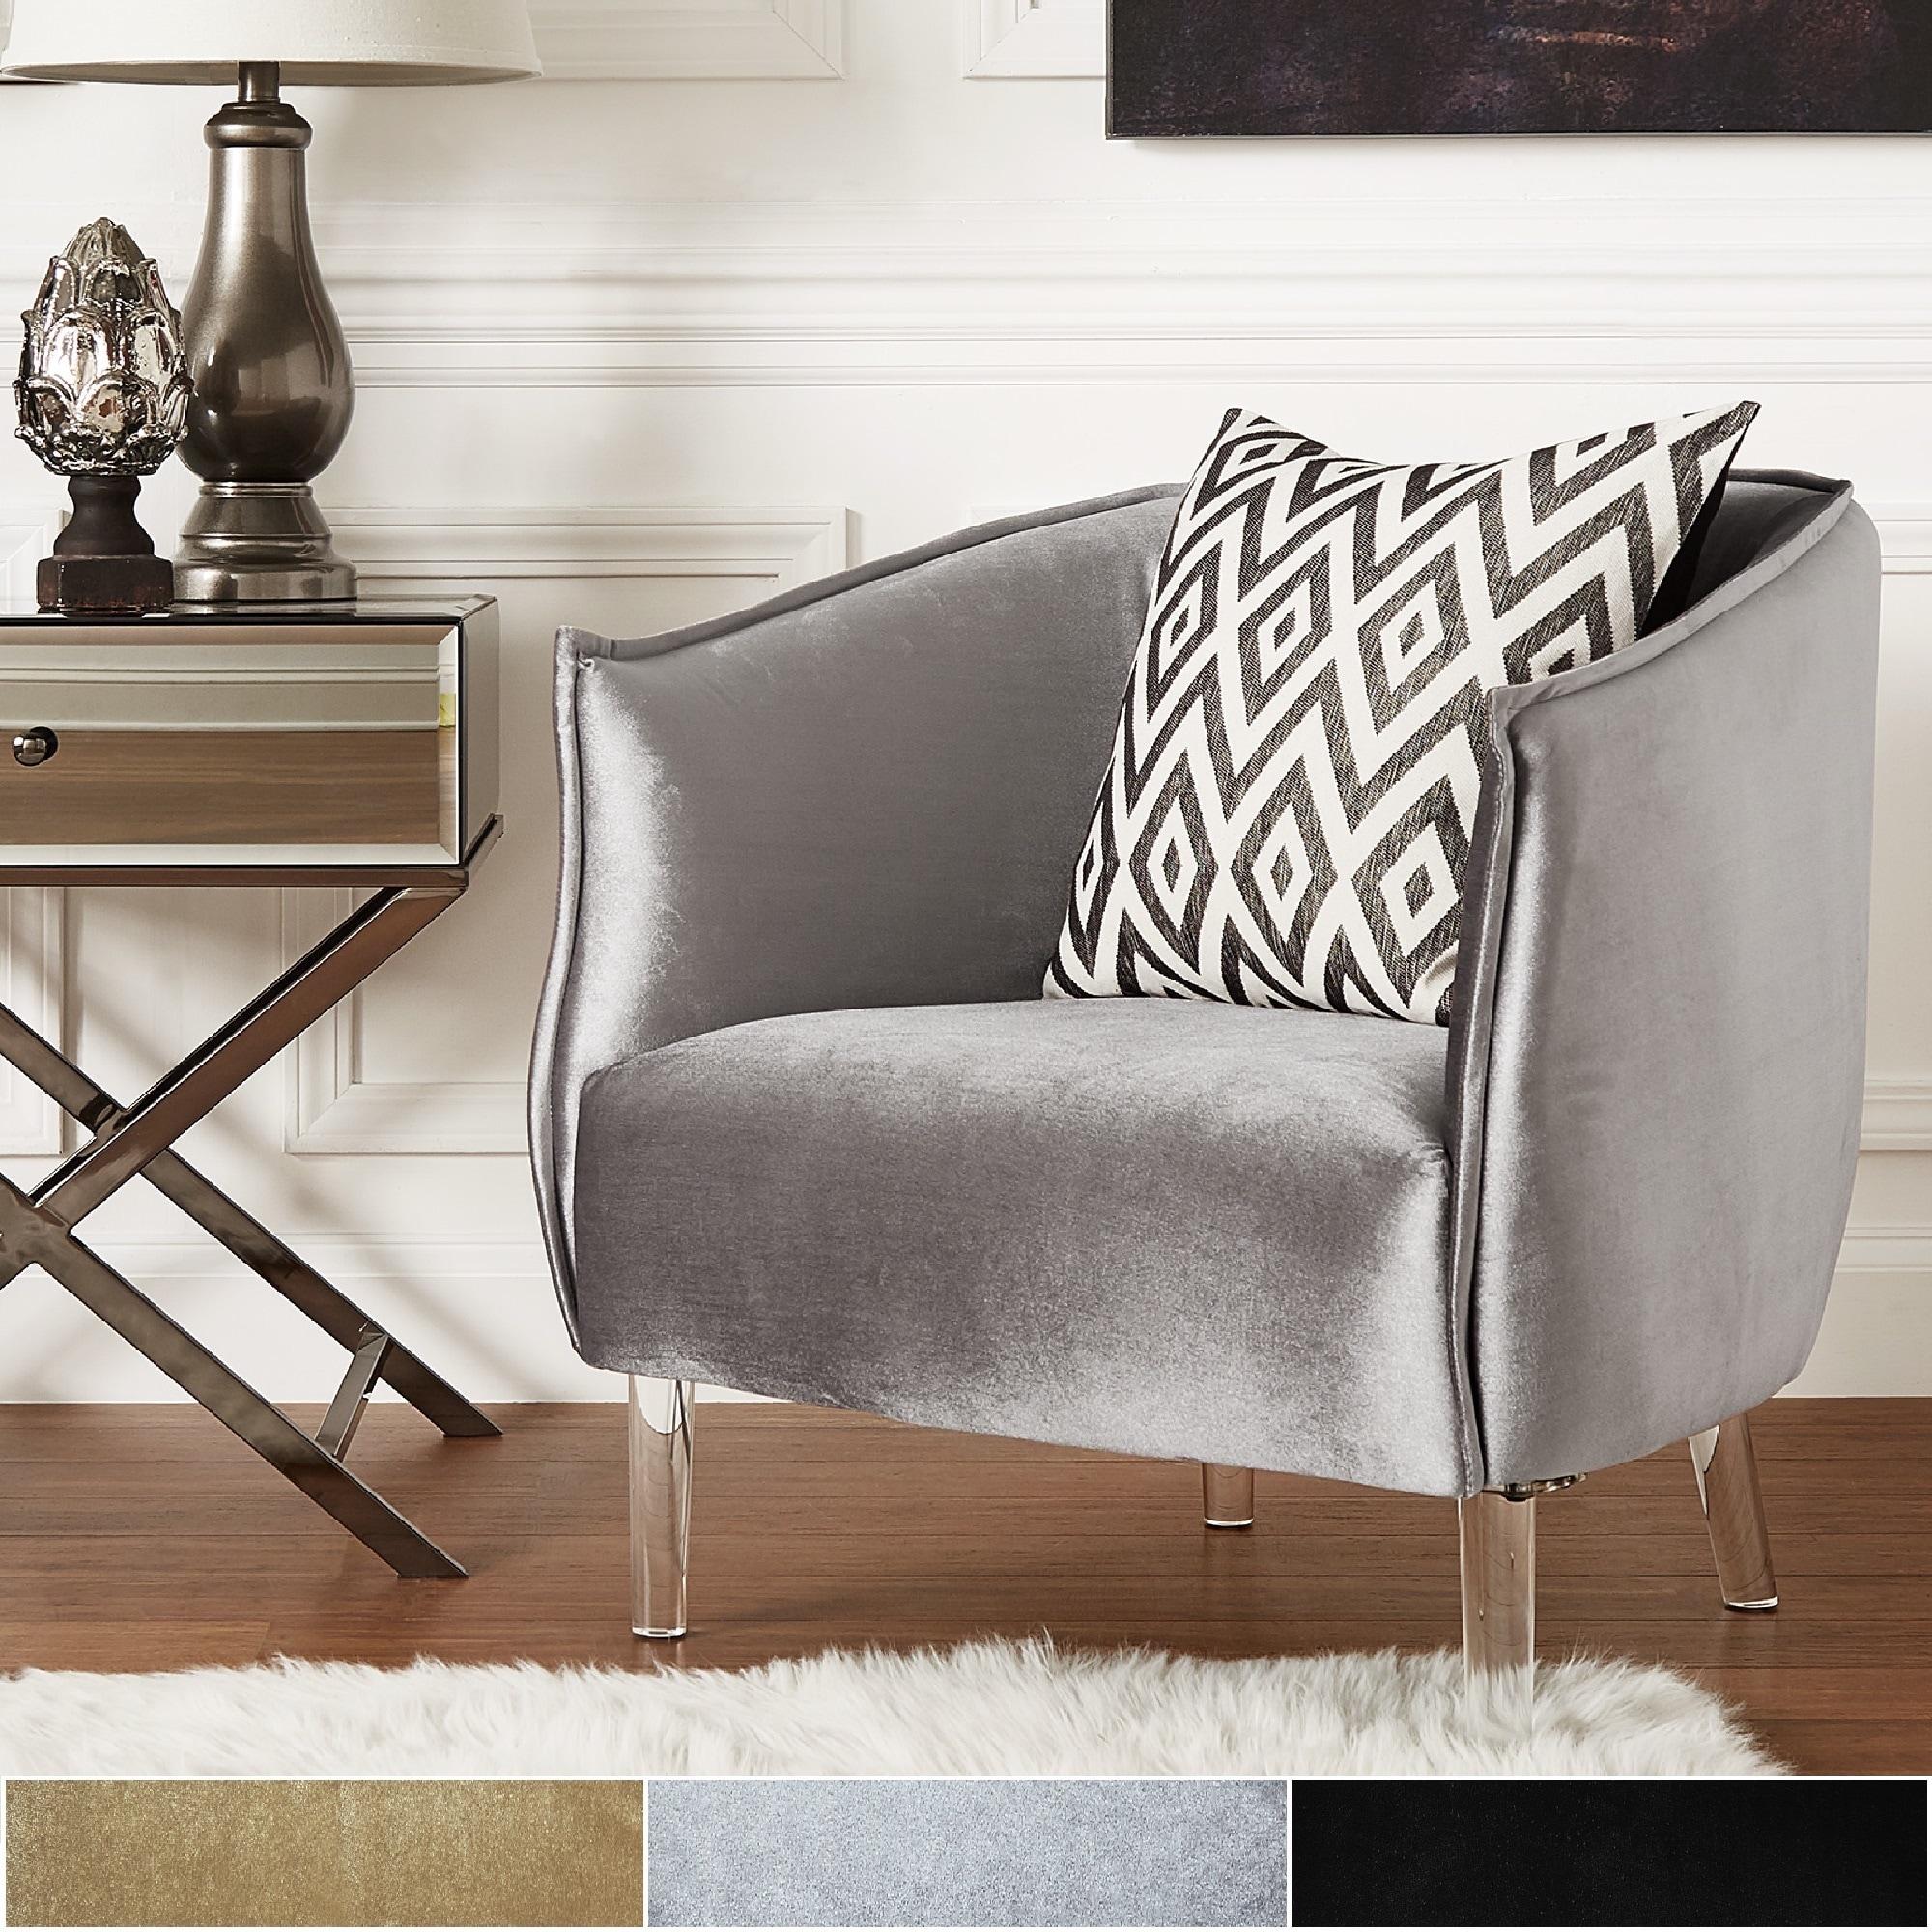 Vianne-Velvet-Curved-Back-Acrylic-Leg-Accent-Chair-